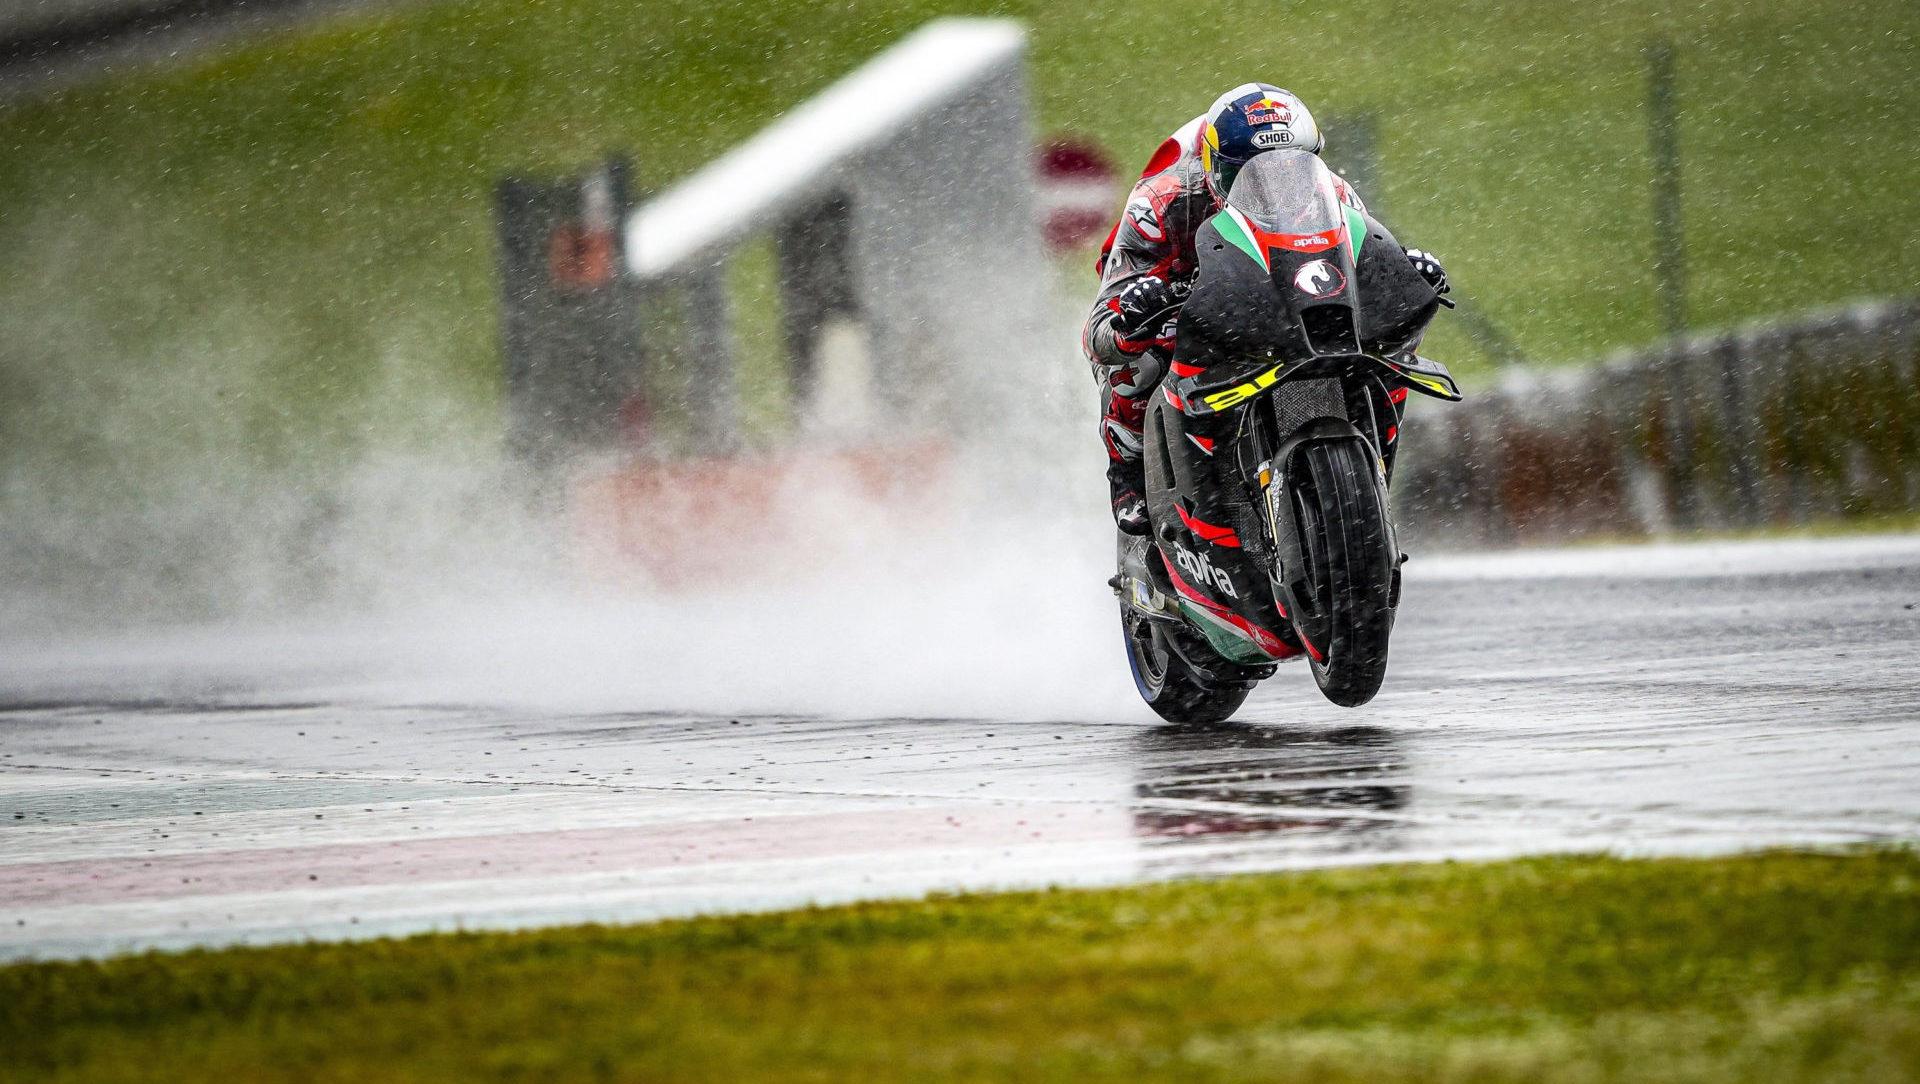 Andrea Dovizioso testing an Aprilia RS-GP MotoGP bike in the wet at Mugello. Photo courtesy Aprilia.